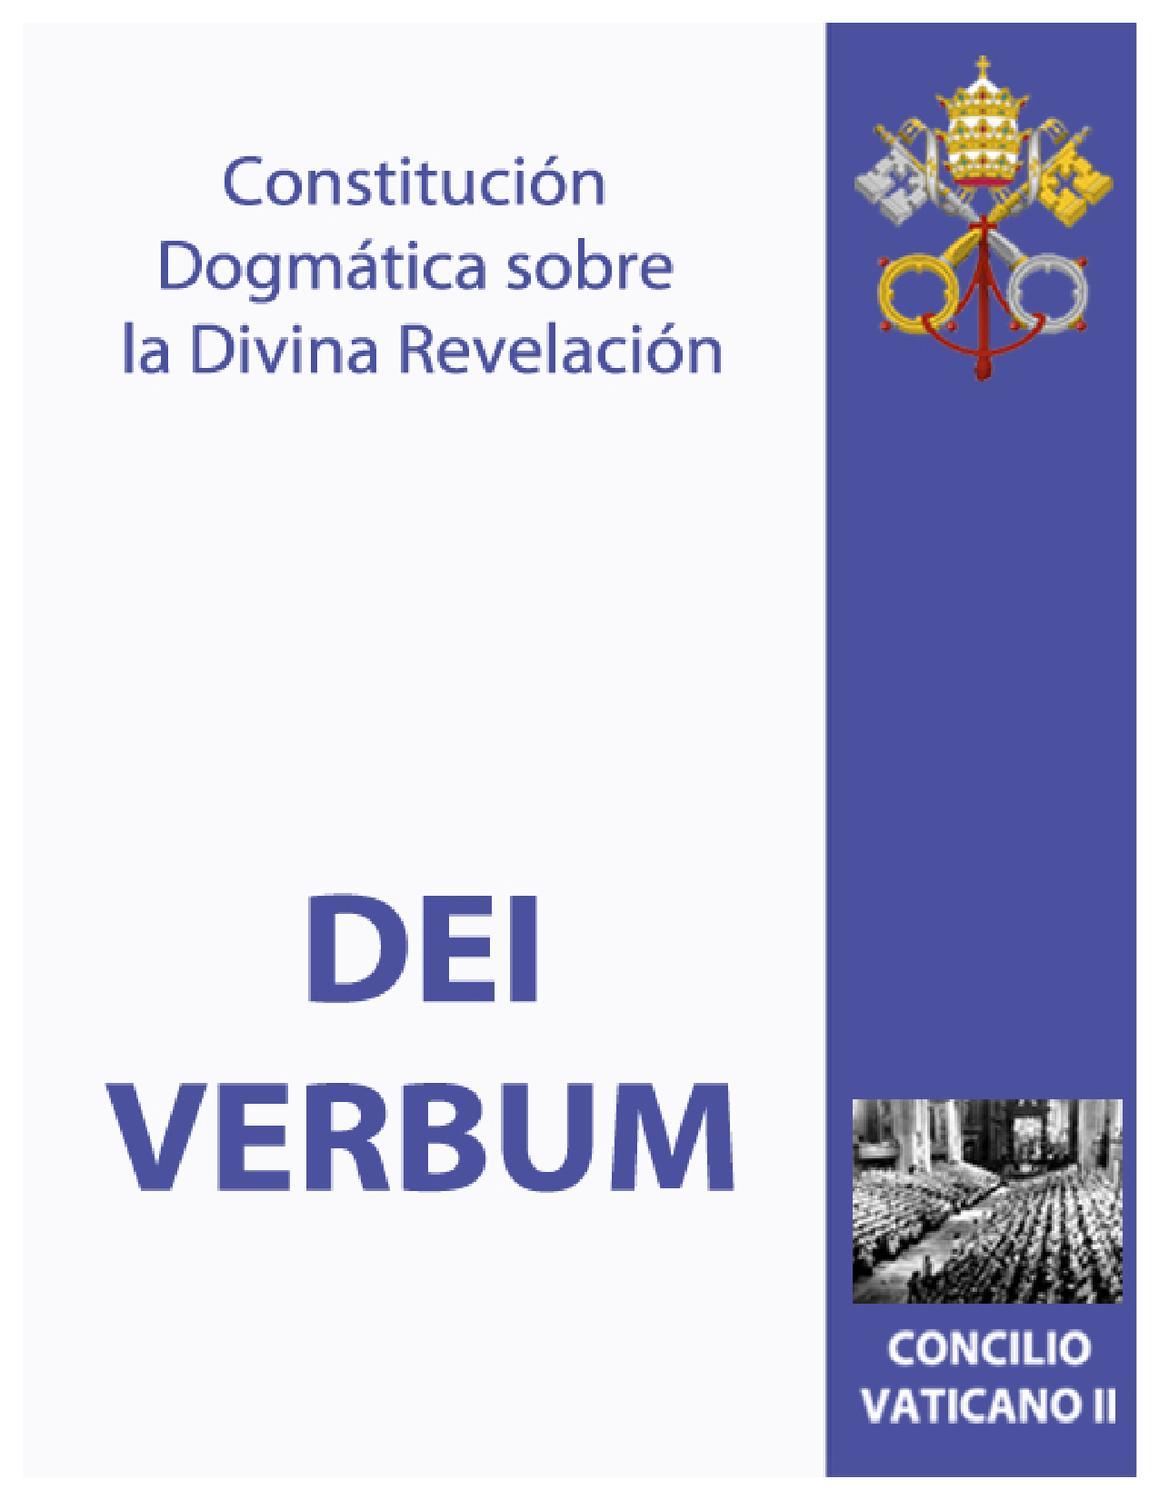 Constitución Dogmática sobre la Divina Revelación,